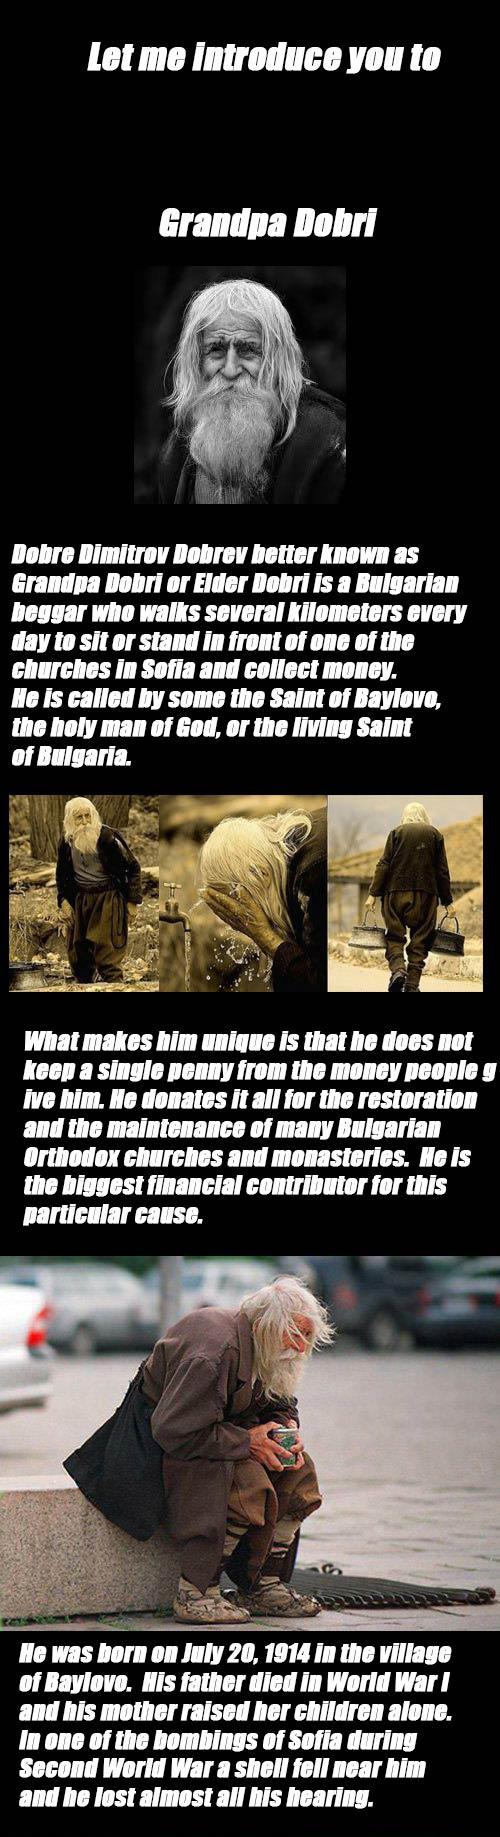 cool-Grandpa-Dobri-story-Bulgarian-old